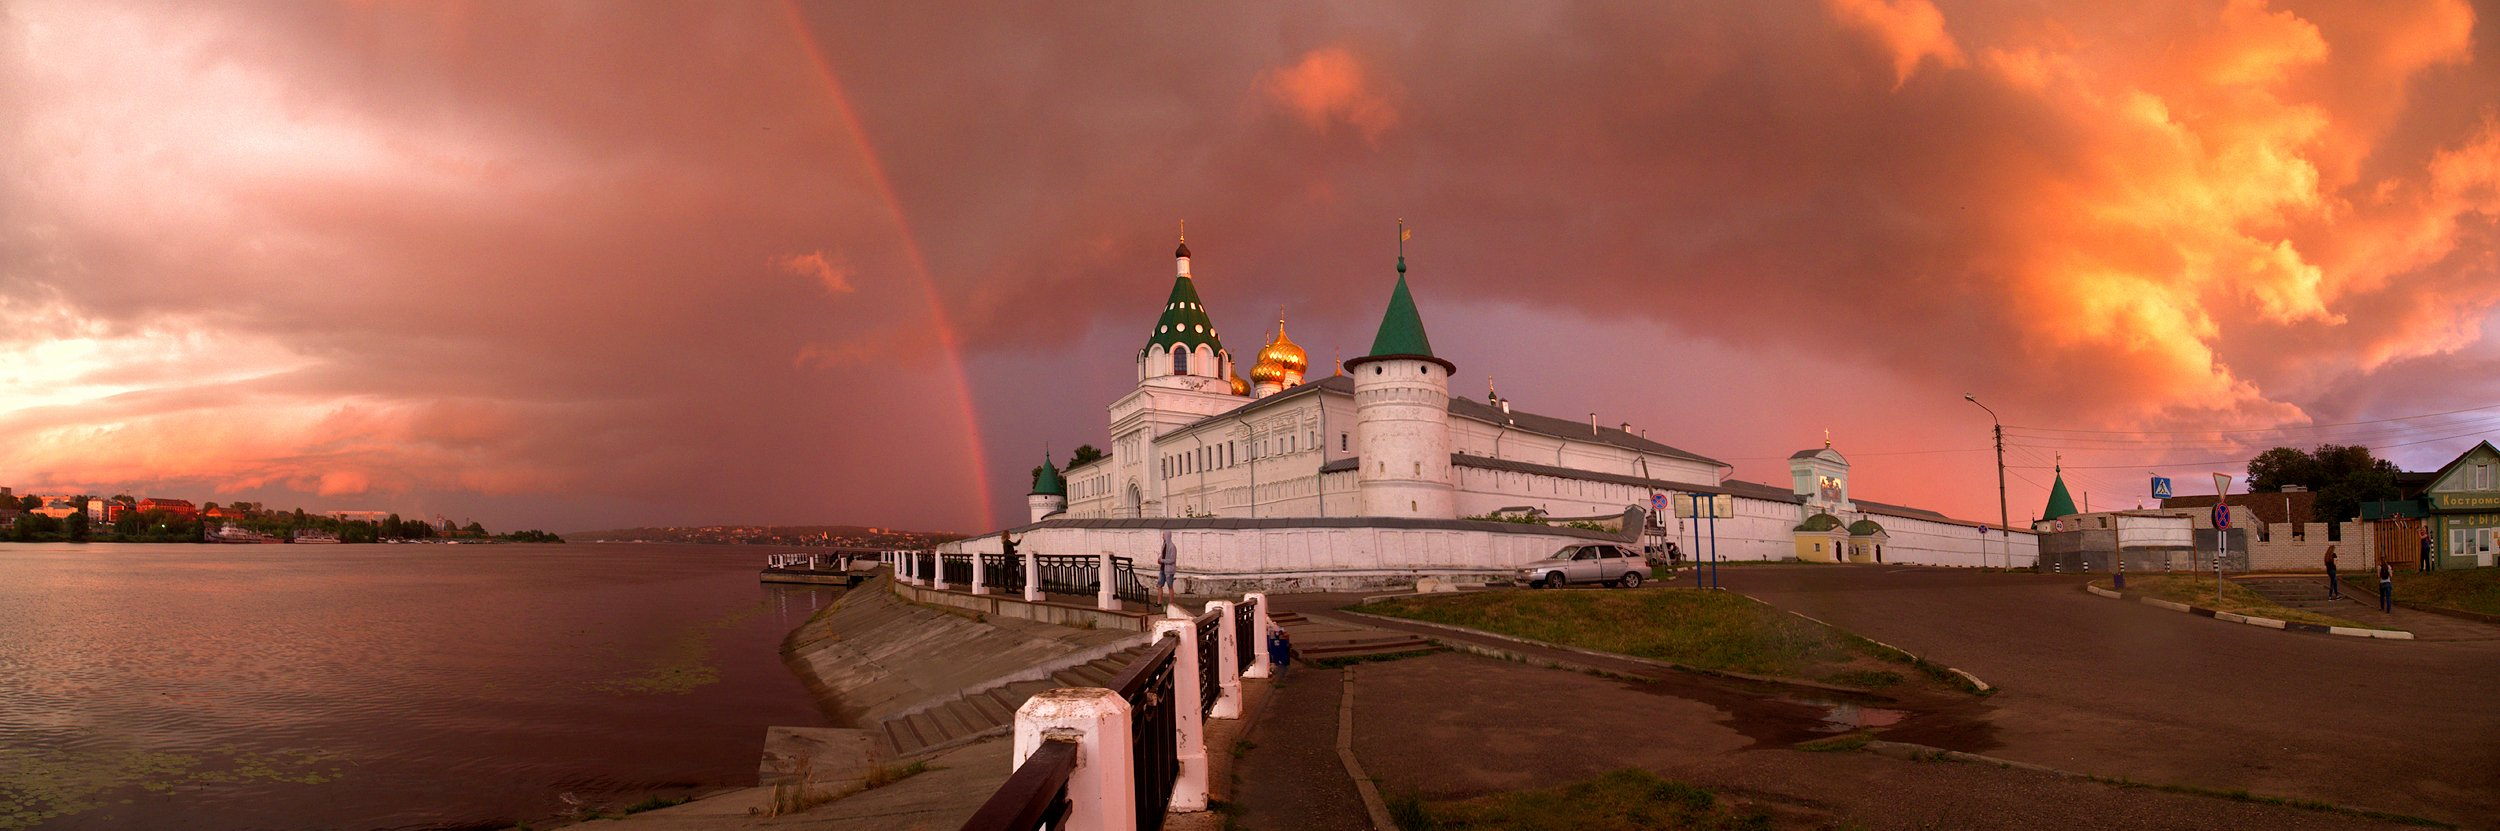 кострома панорама гроза монастырь, Марина Брыдня